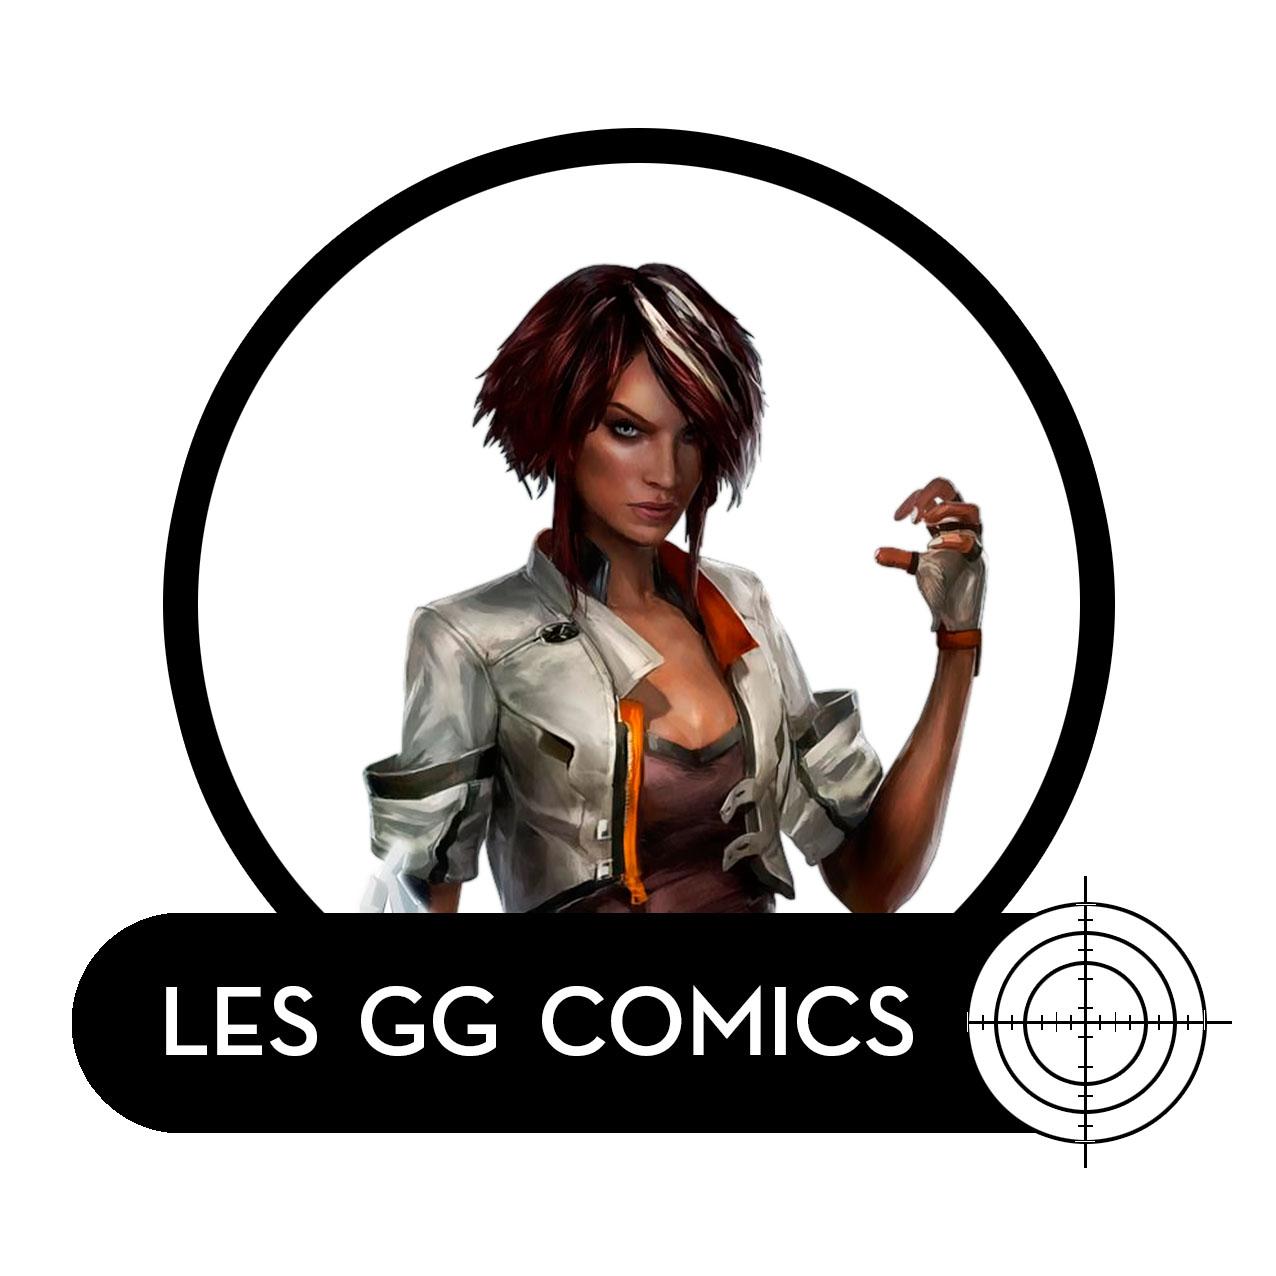 Les GG comics - HS6 : ITW d'Aleksi Briclot [Comic Con Paris 2019]